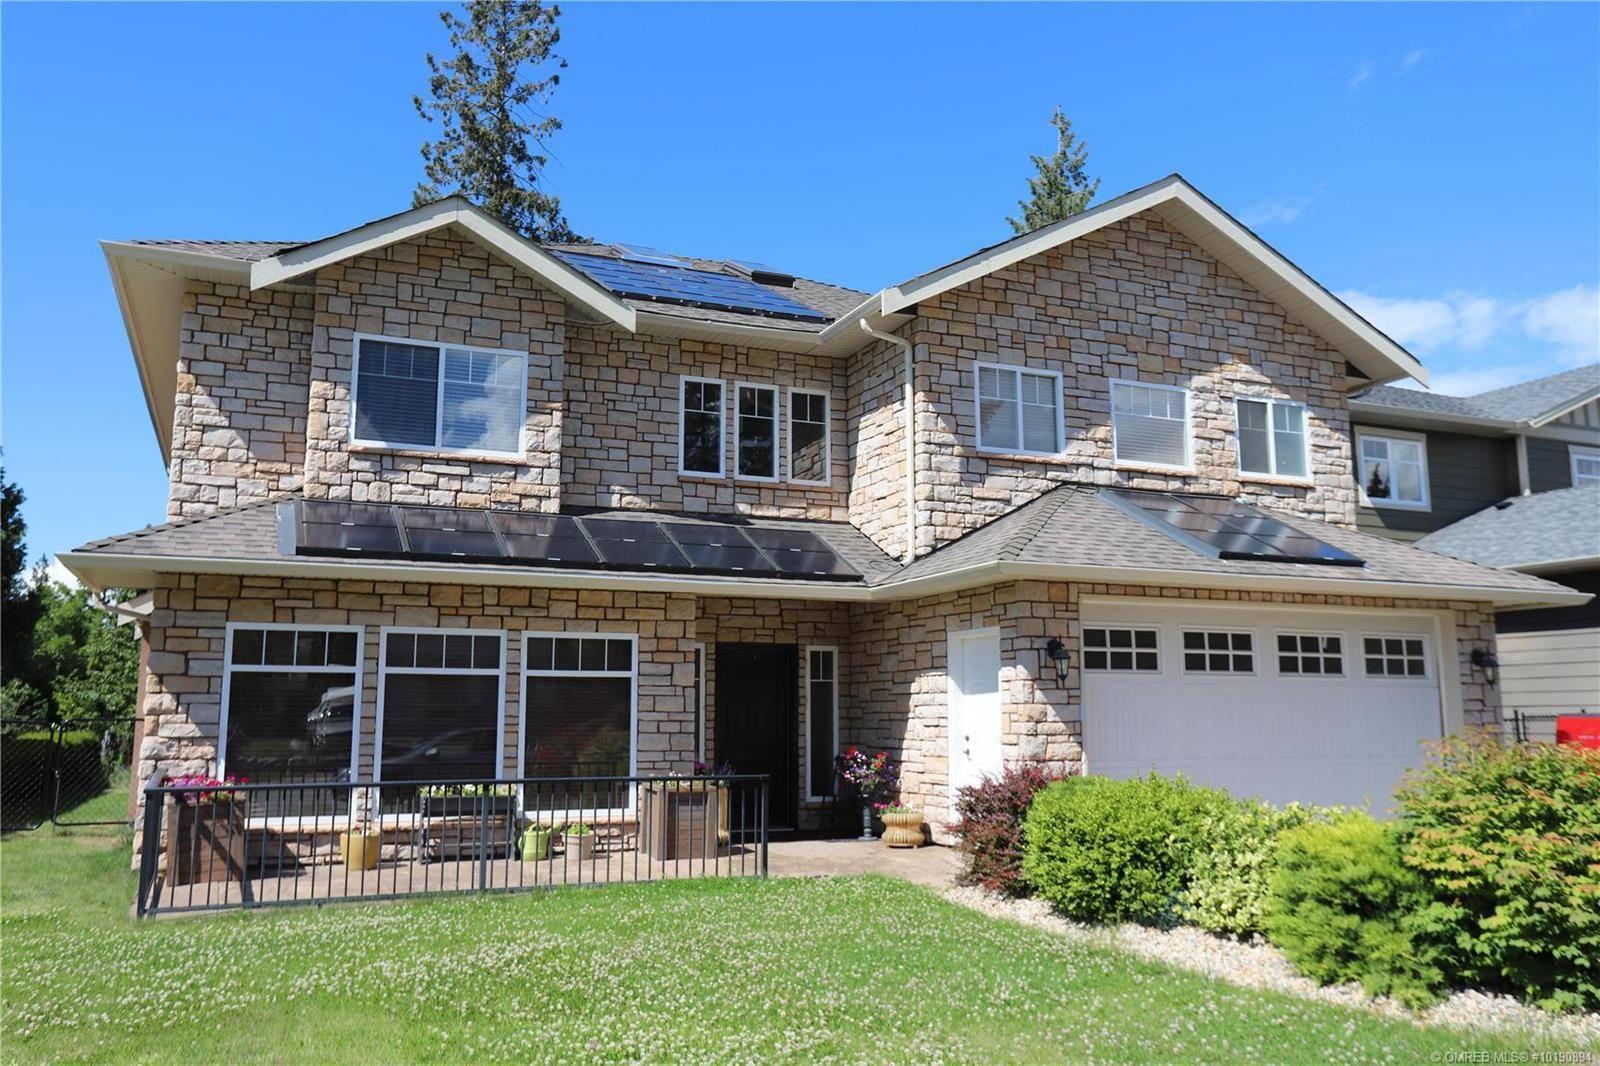 House for sale at 712 Mcclure Rd Kelowna British Columbia - MLS: 10190894